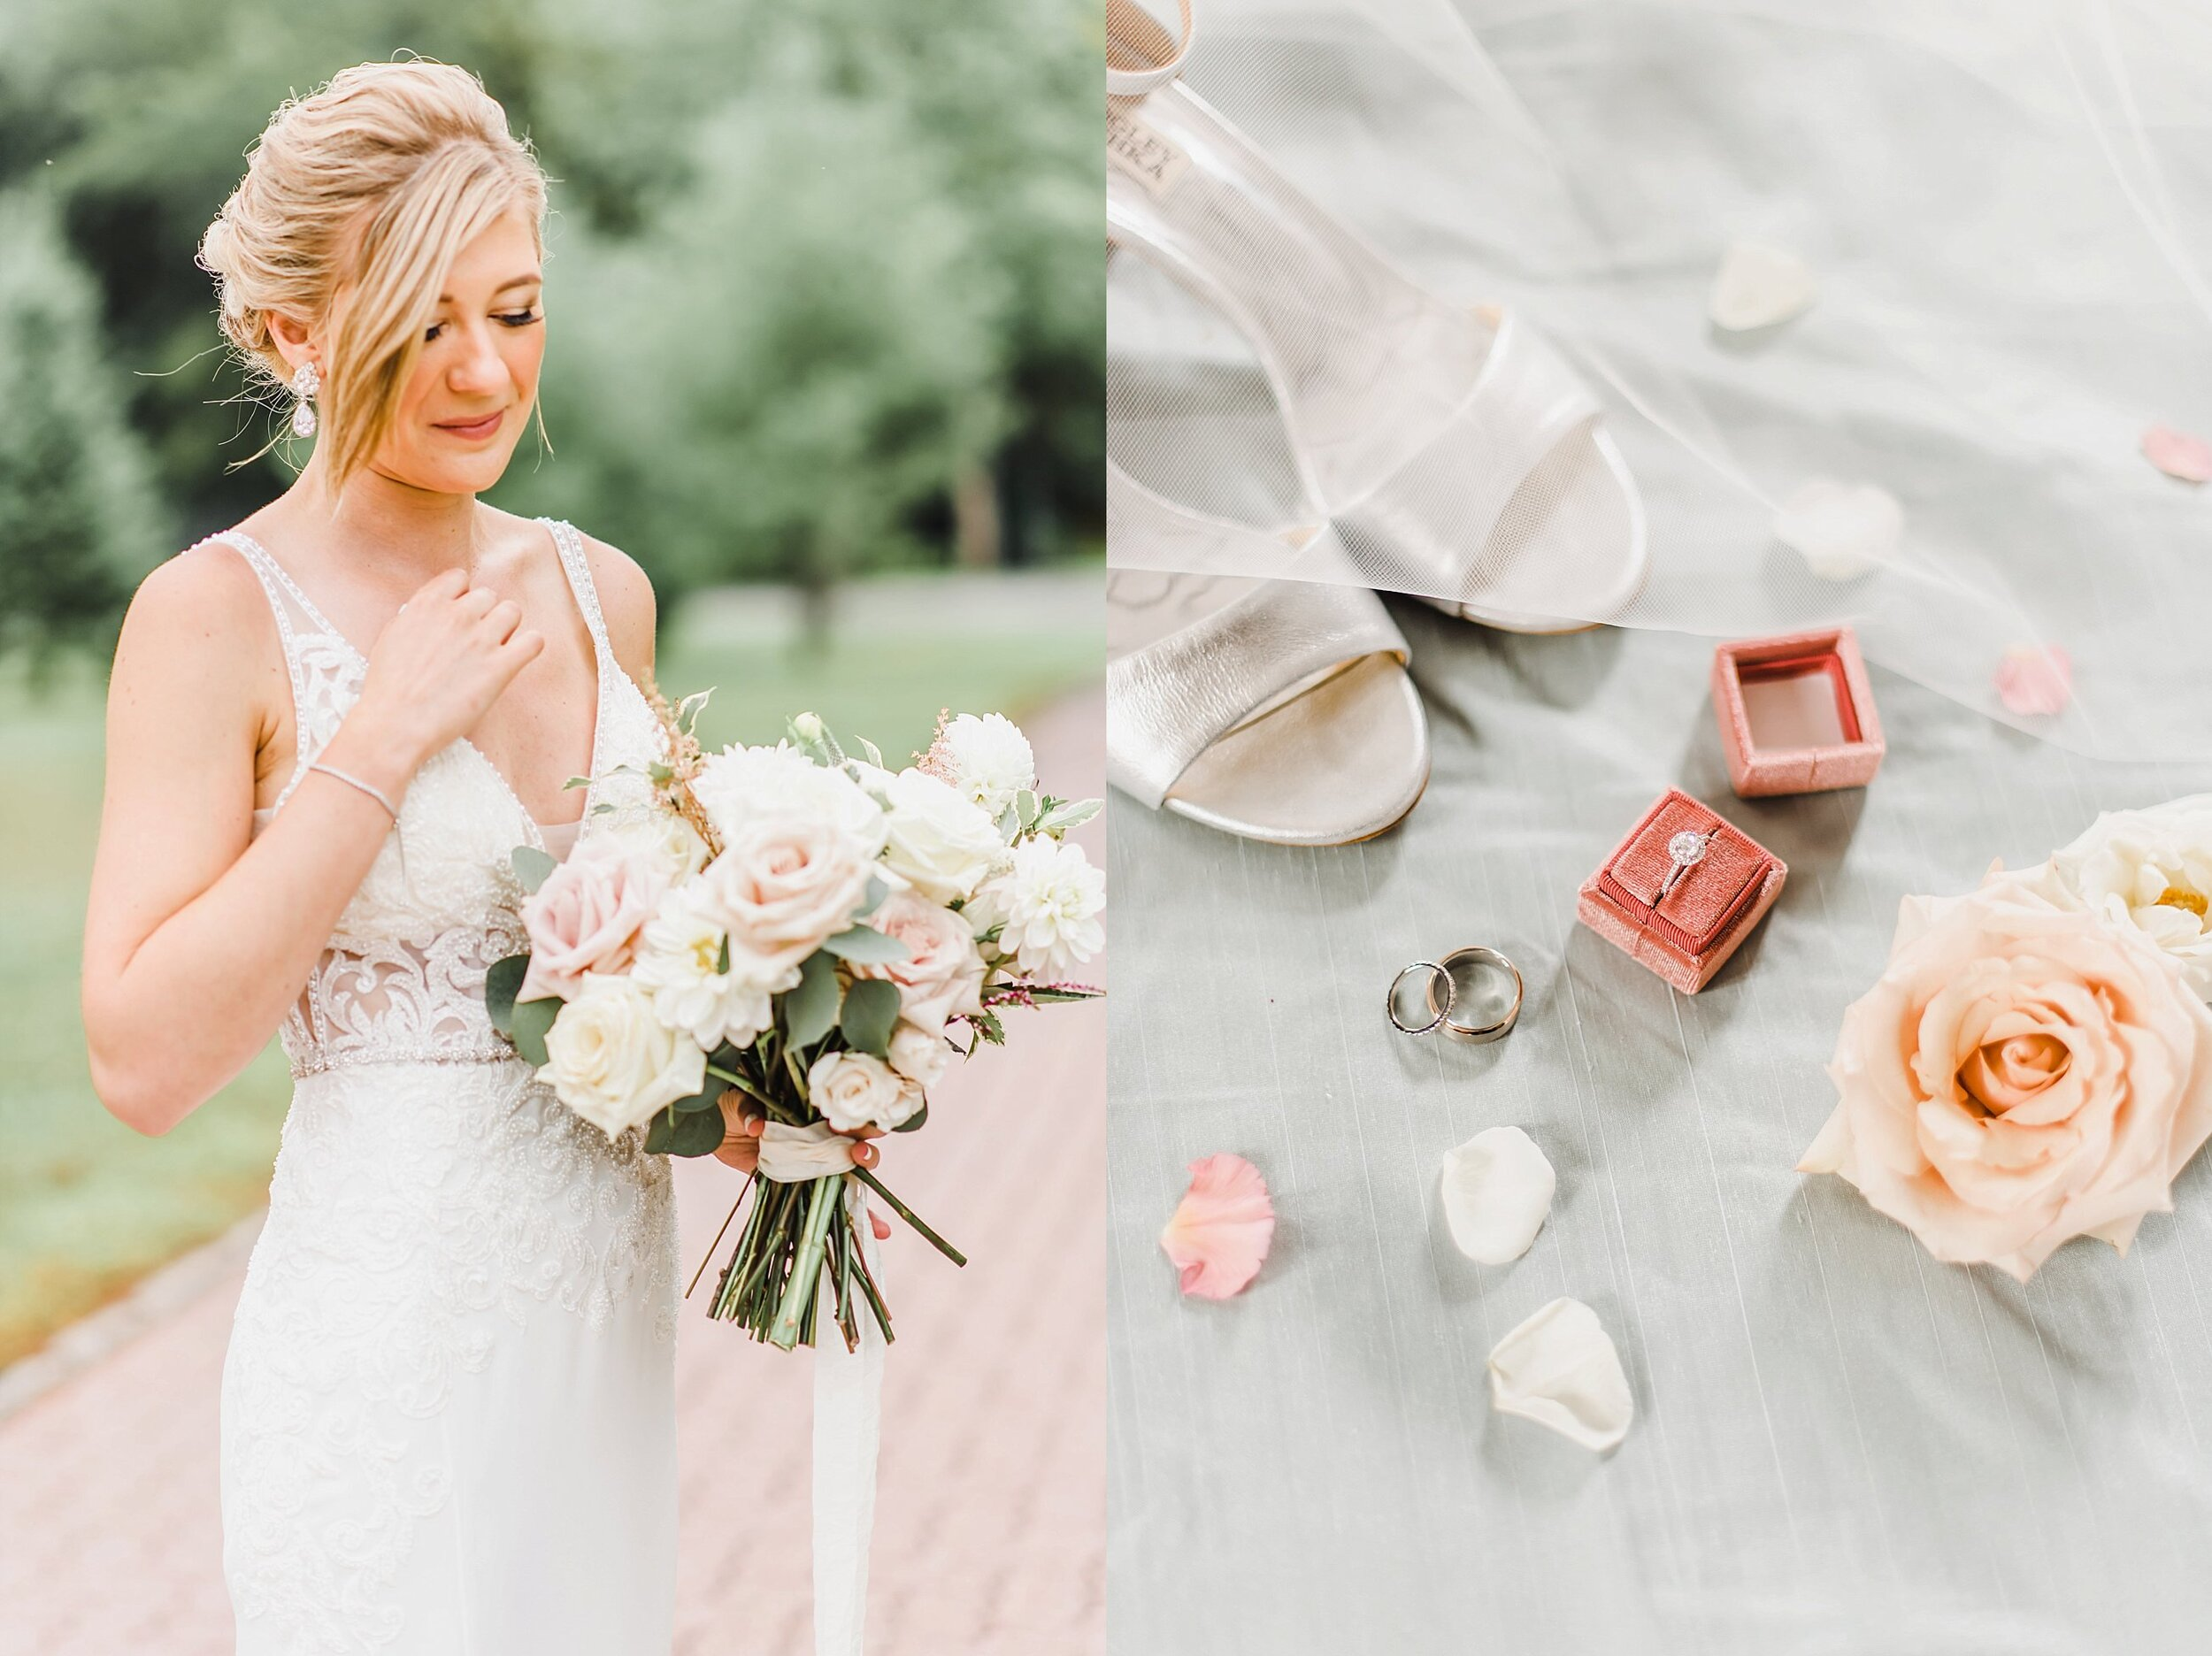 light airy fine art ottawa wedding photographer | Ali and Batoul Photography | Fairmont Le Chateau Montebello27.jpg